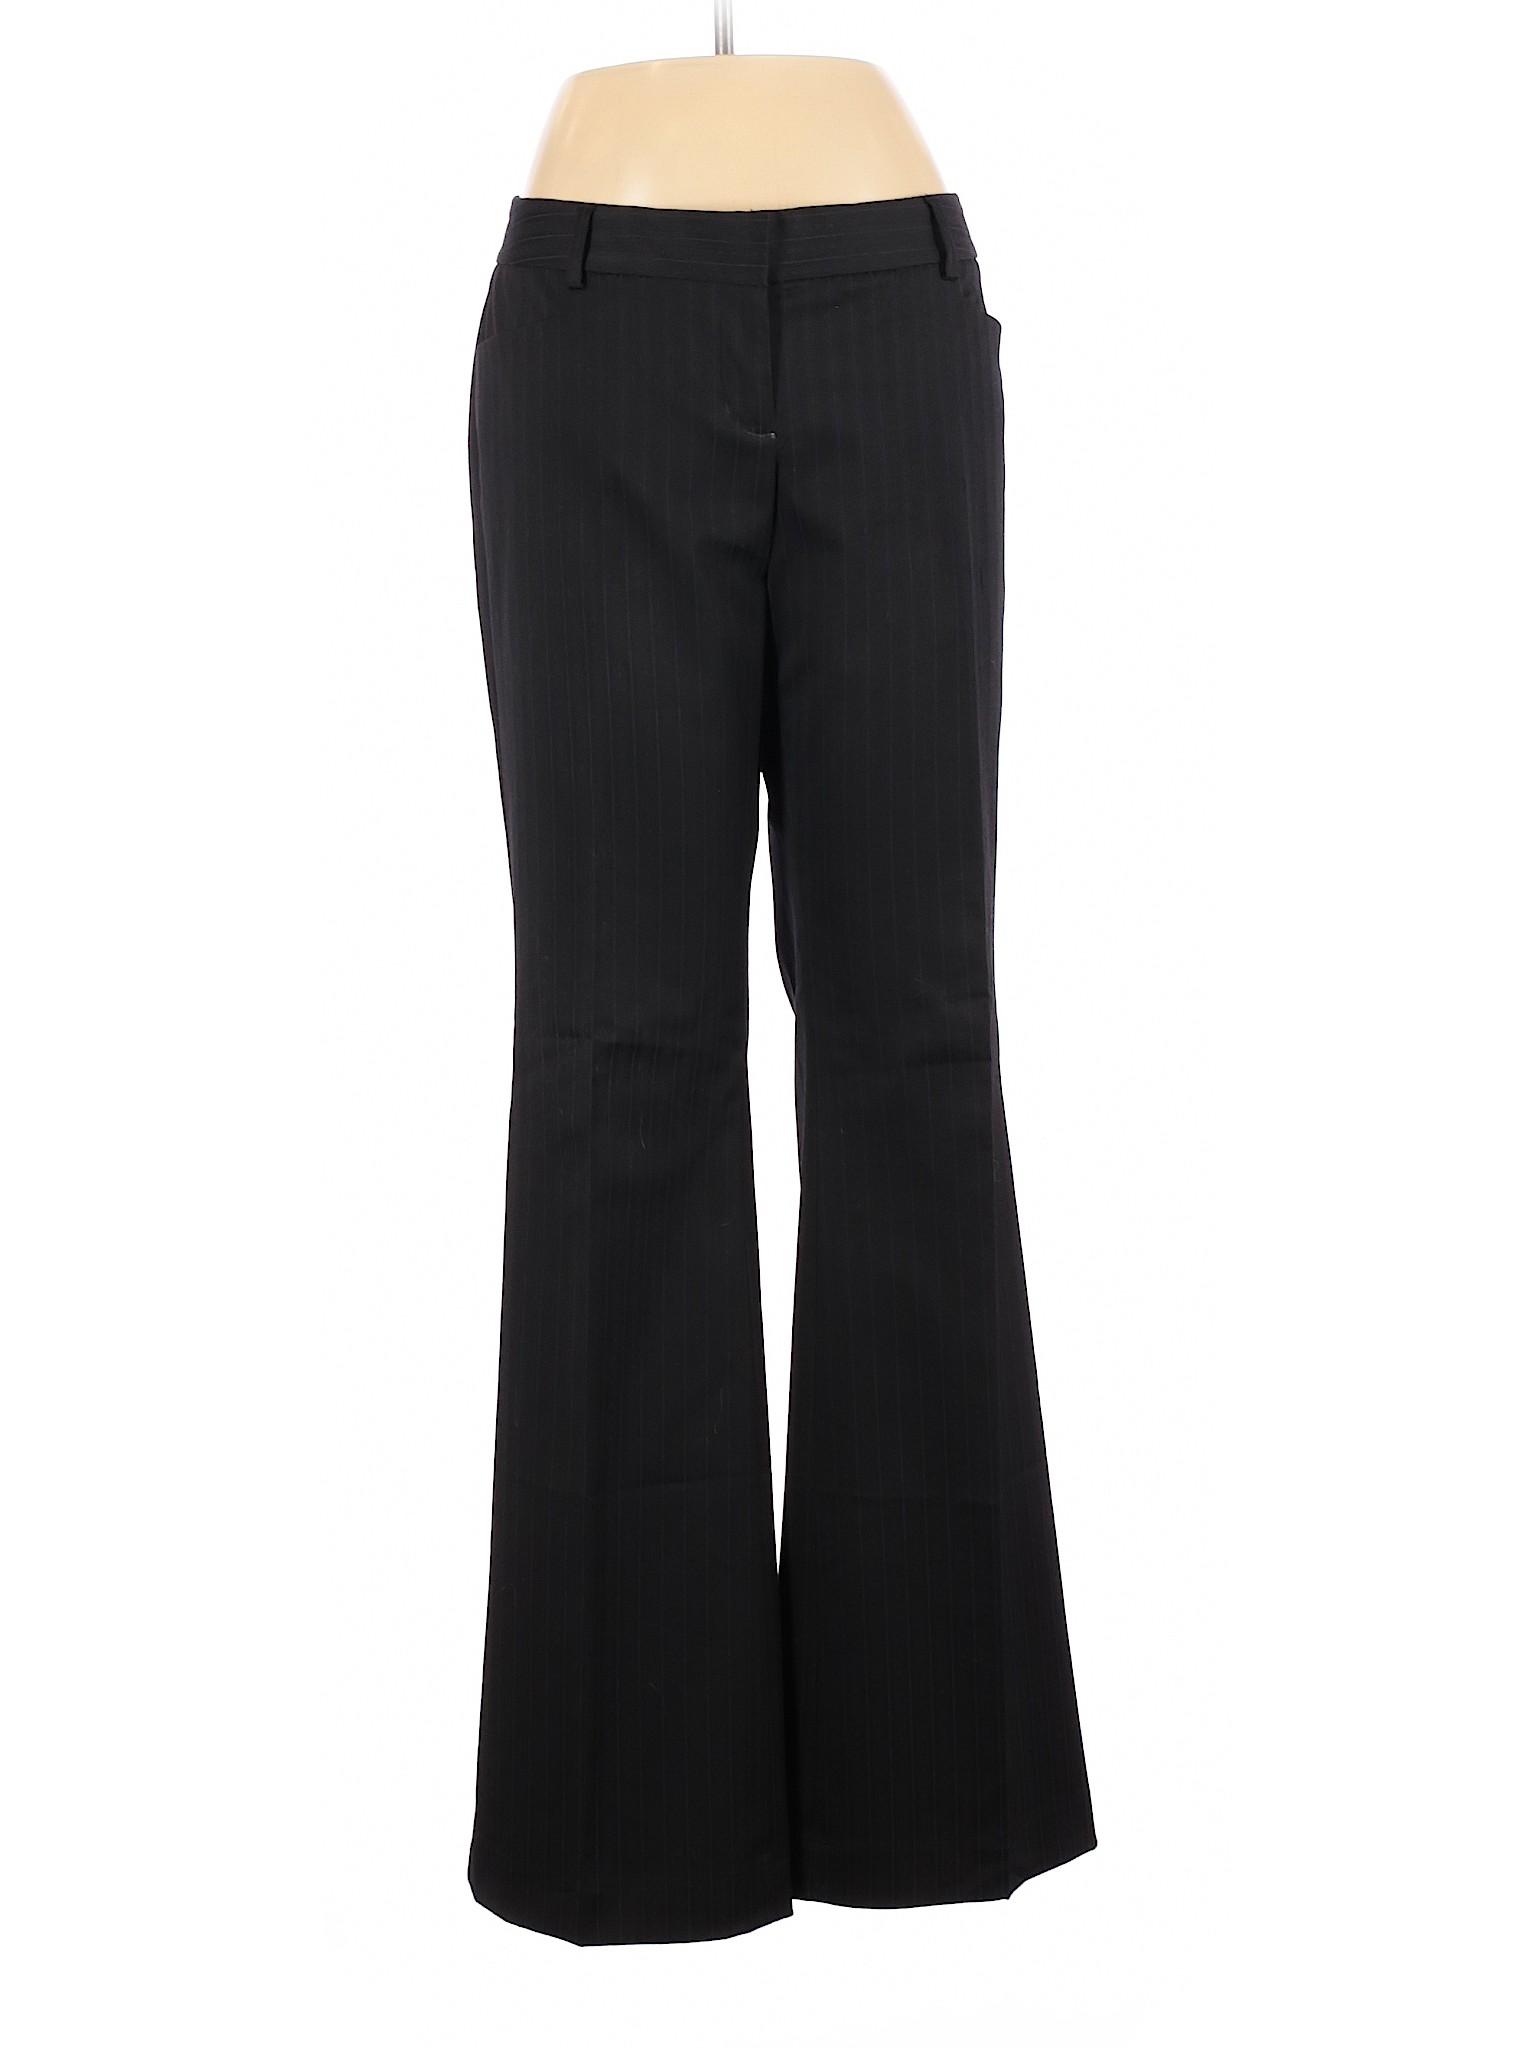 Express Design Studio Women Black Dress Pants 10 Ebay